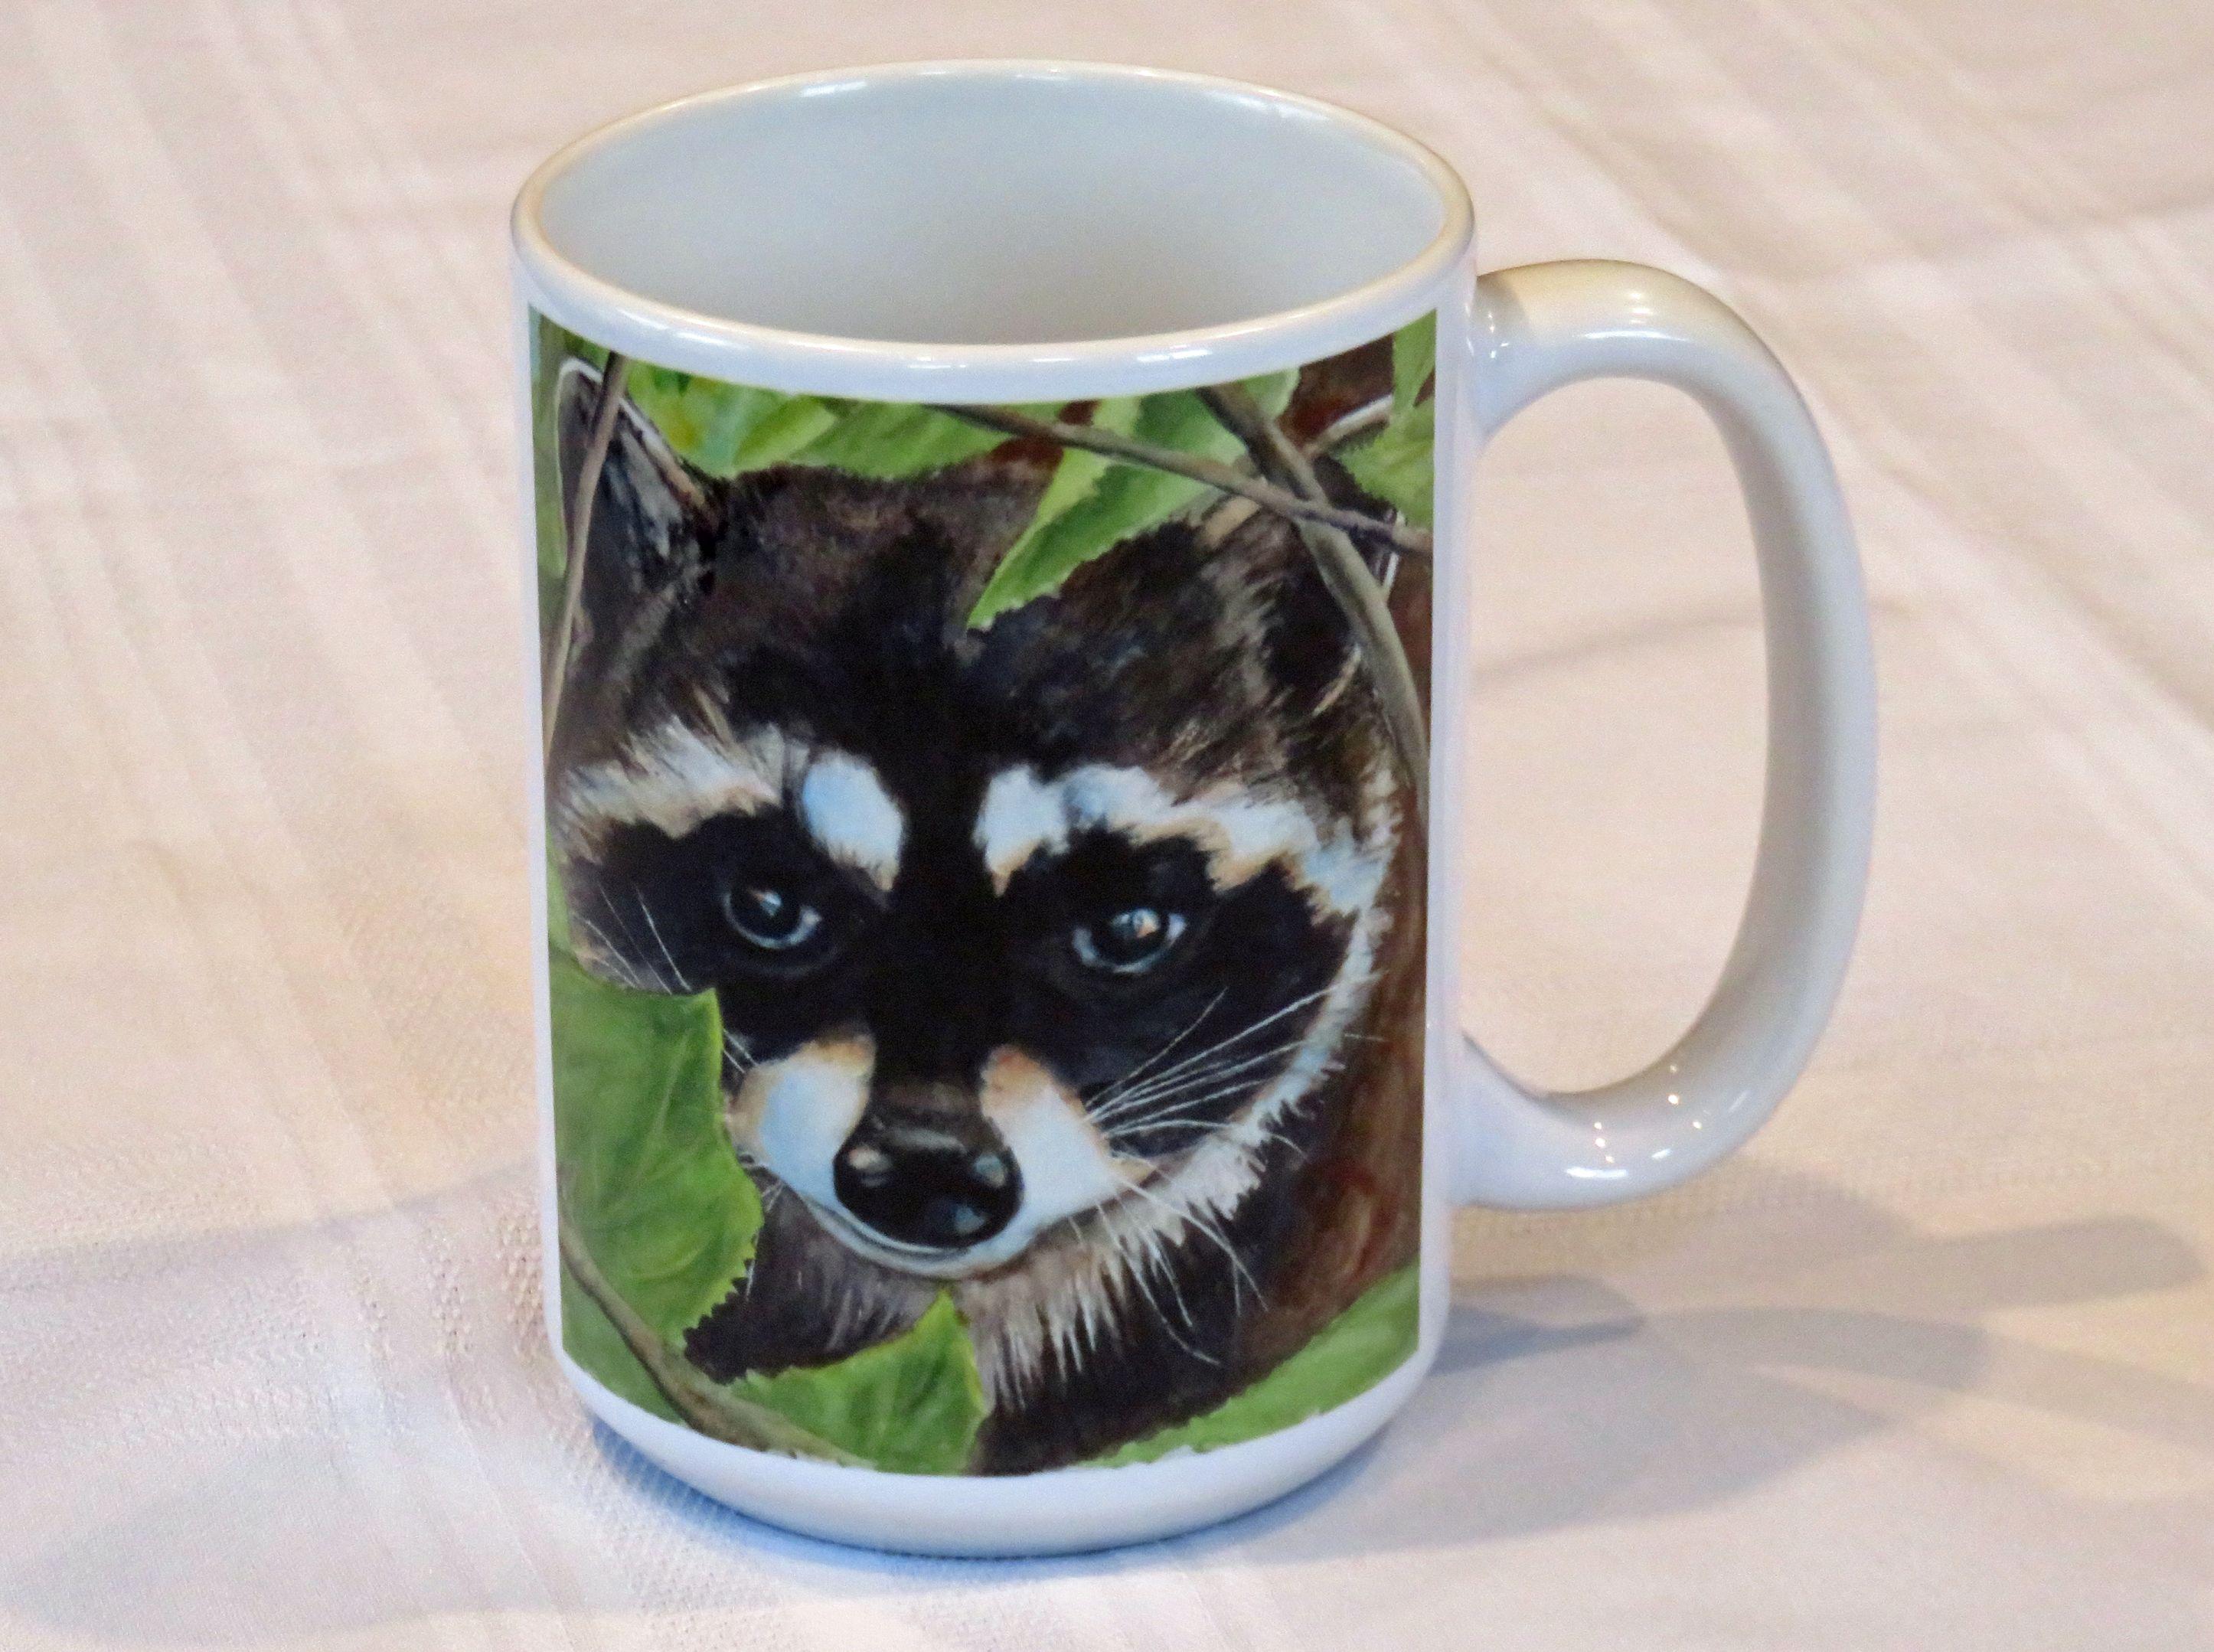 Mug - I See You